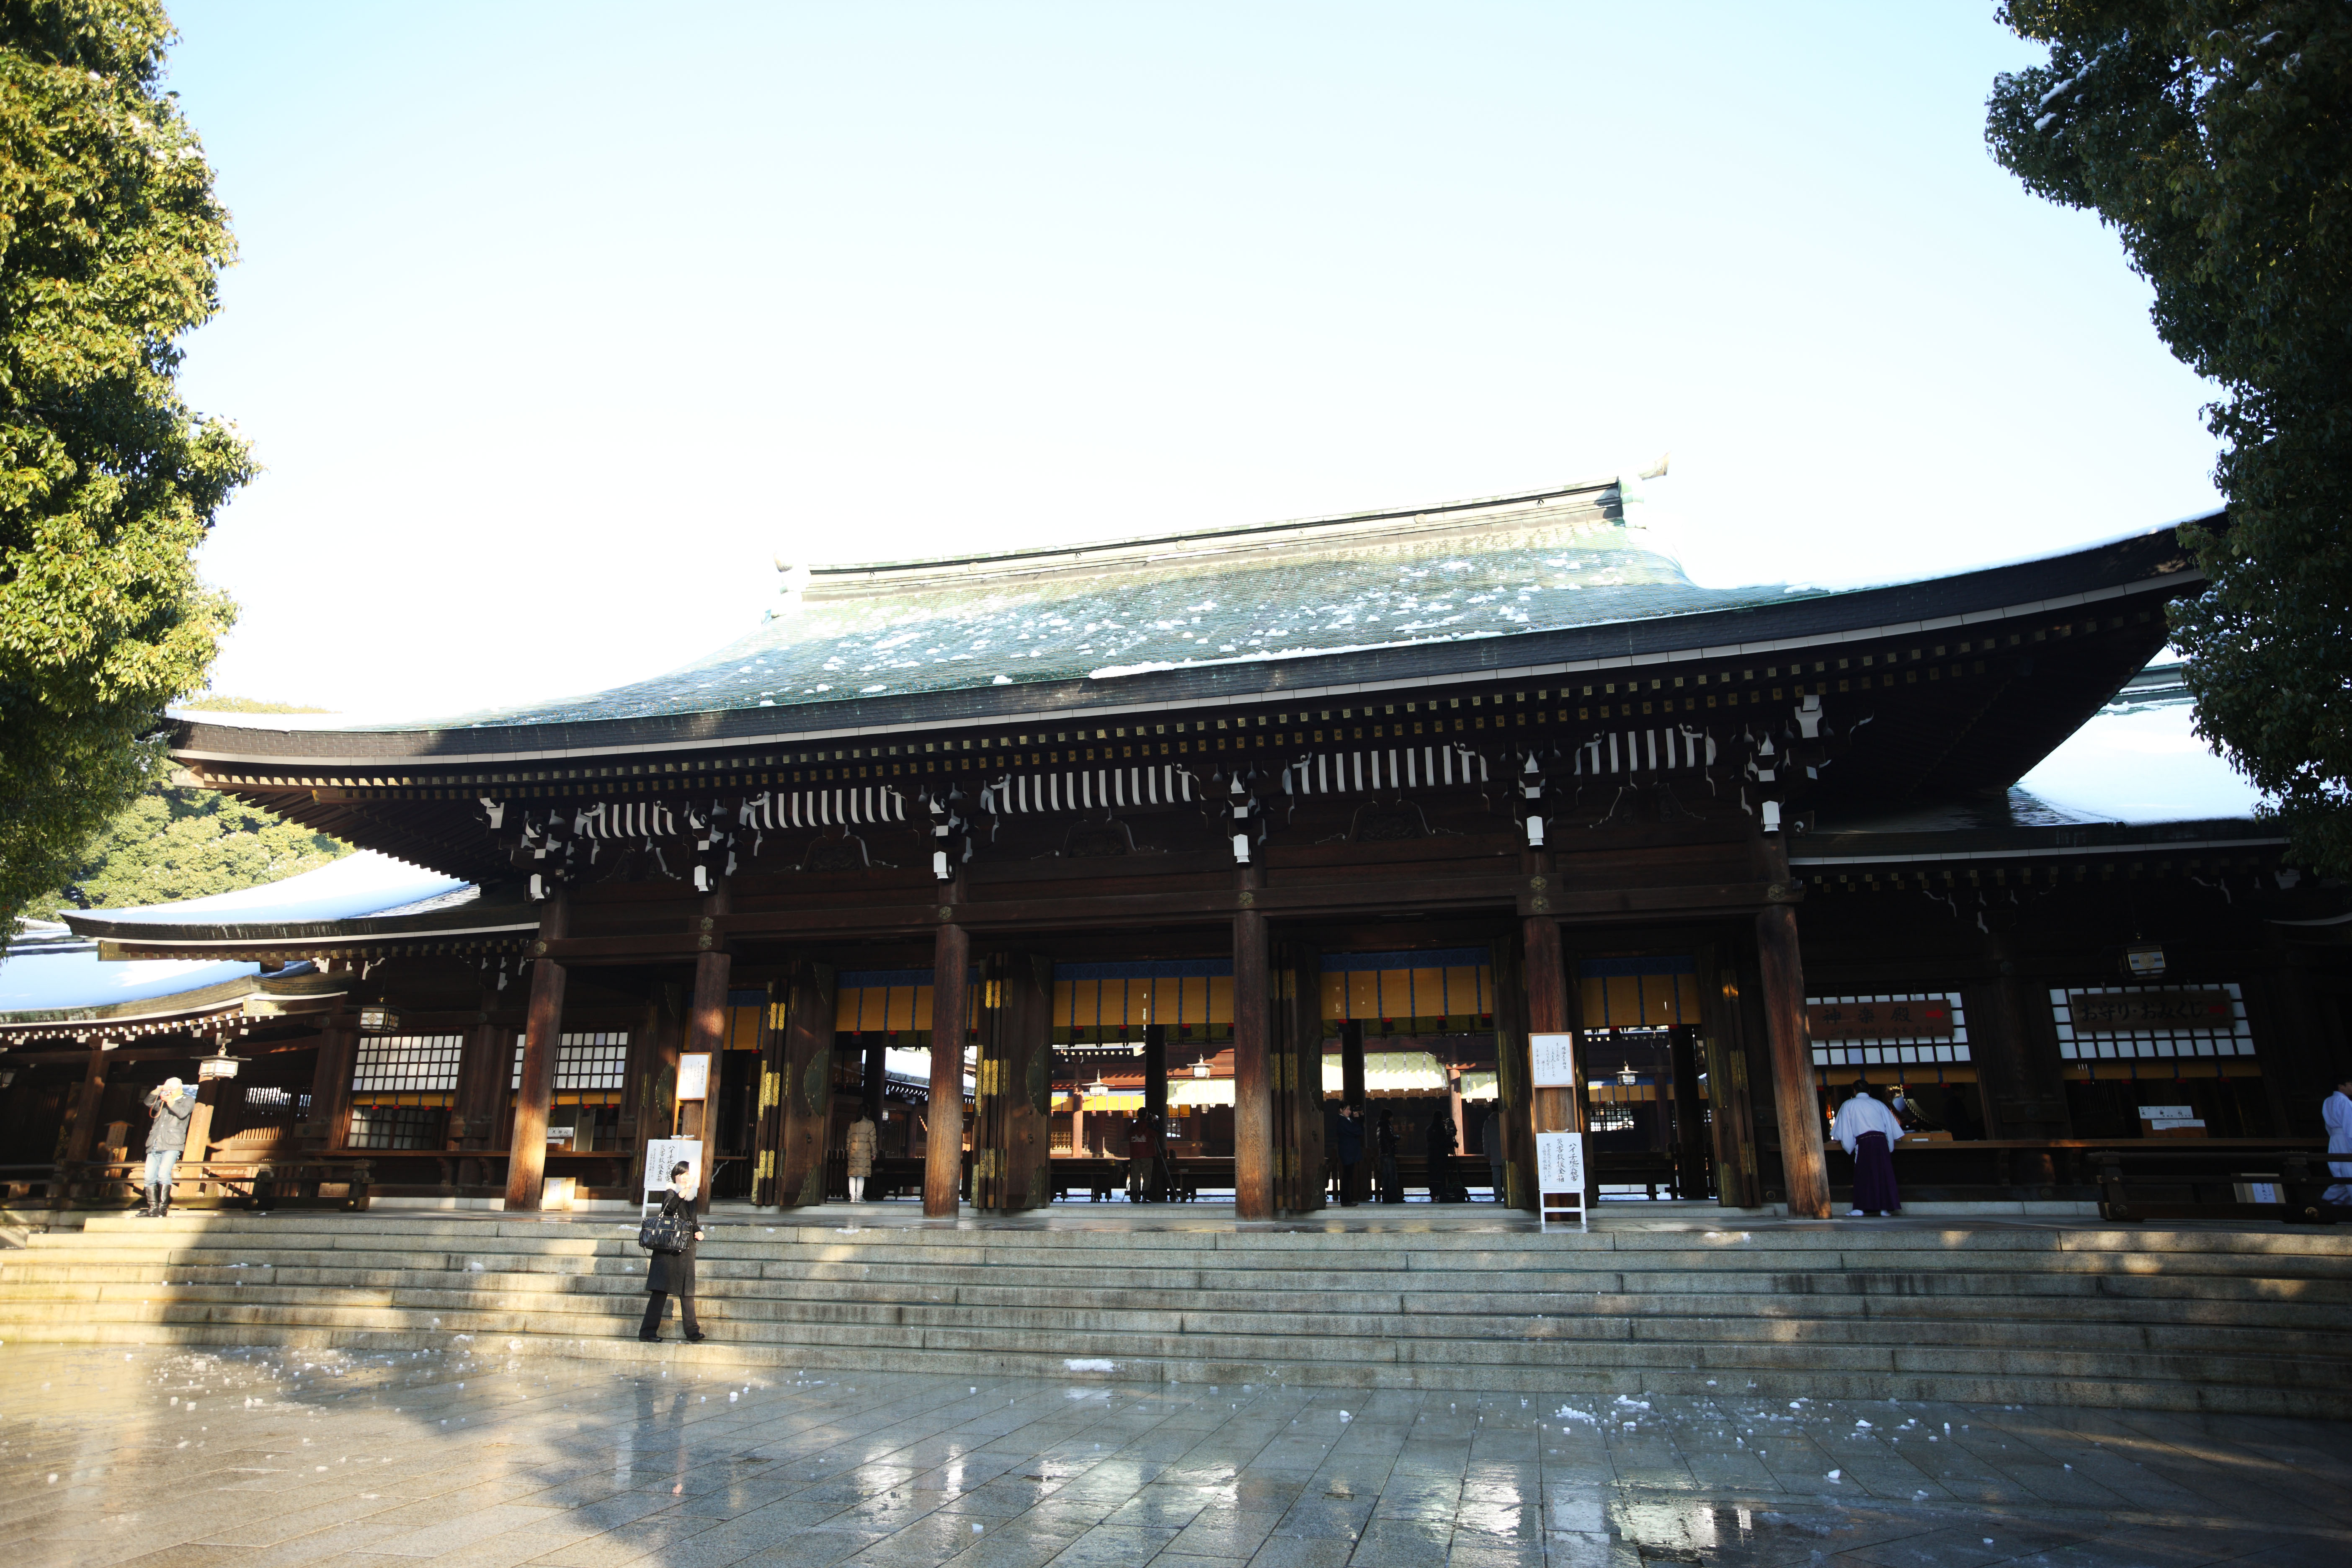 Yun Free Stock Photos : No. 9523 Meiji Shrine front shrine ...